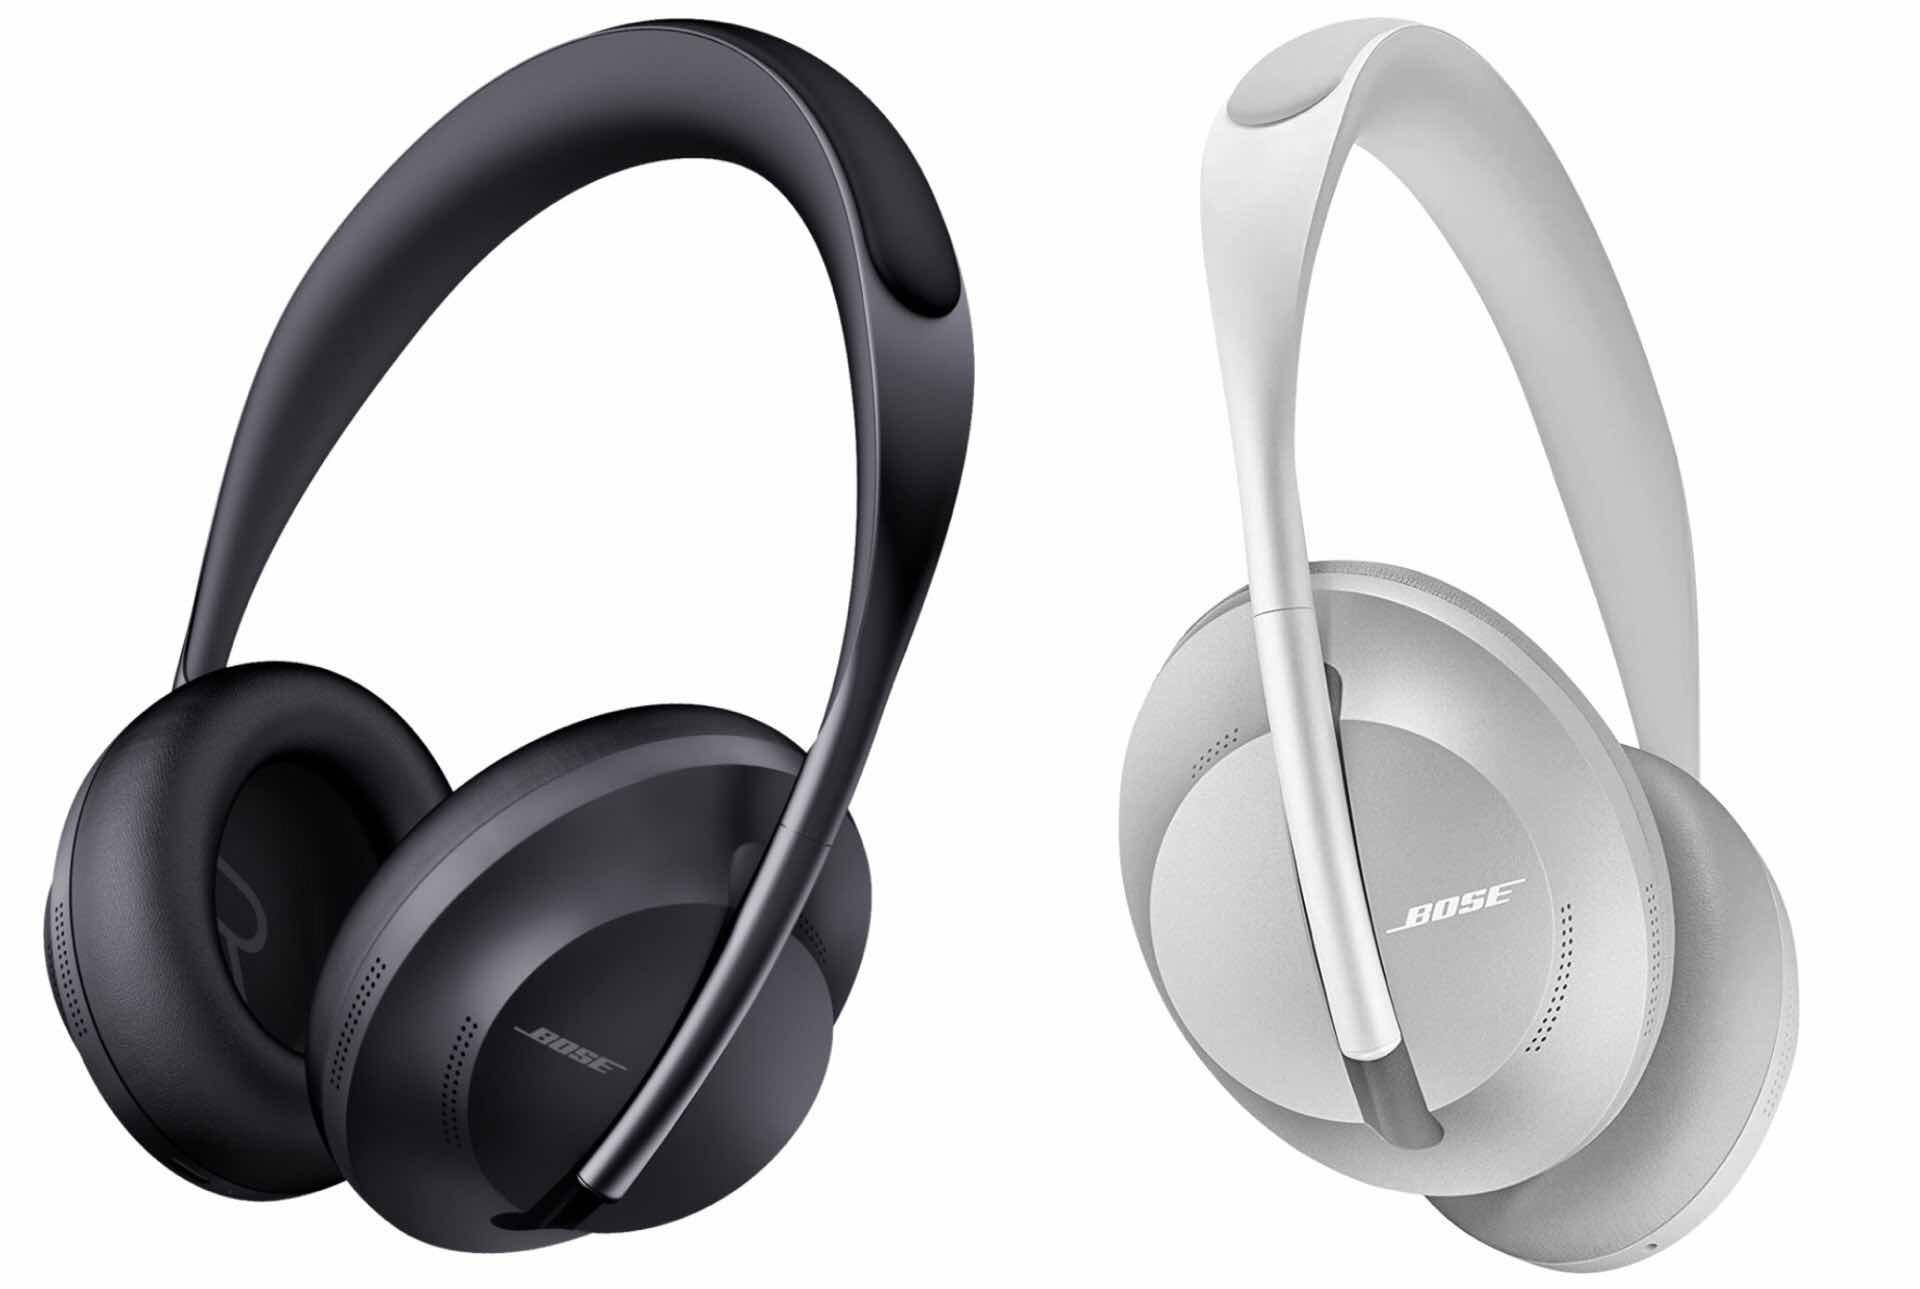 Bose's Noise-Cancelling Headphones 700 ($399)